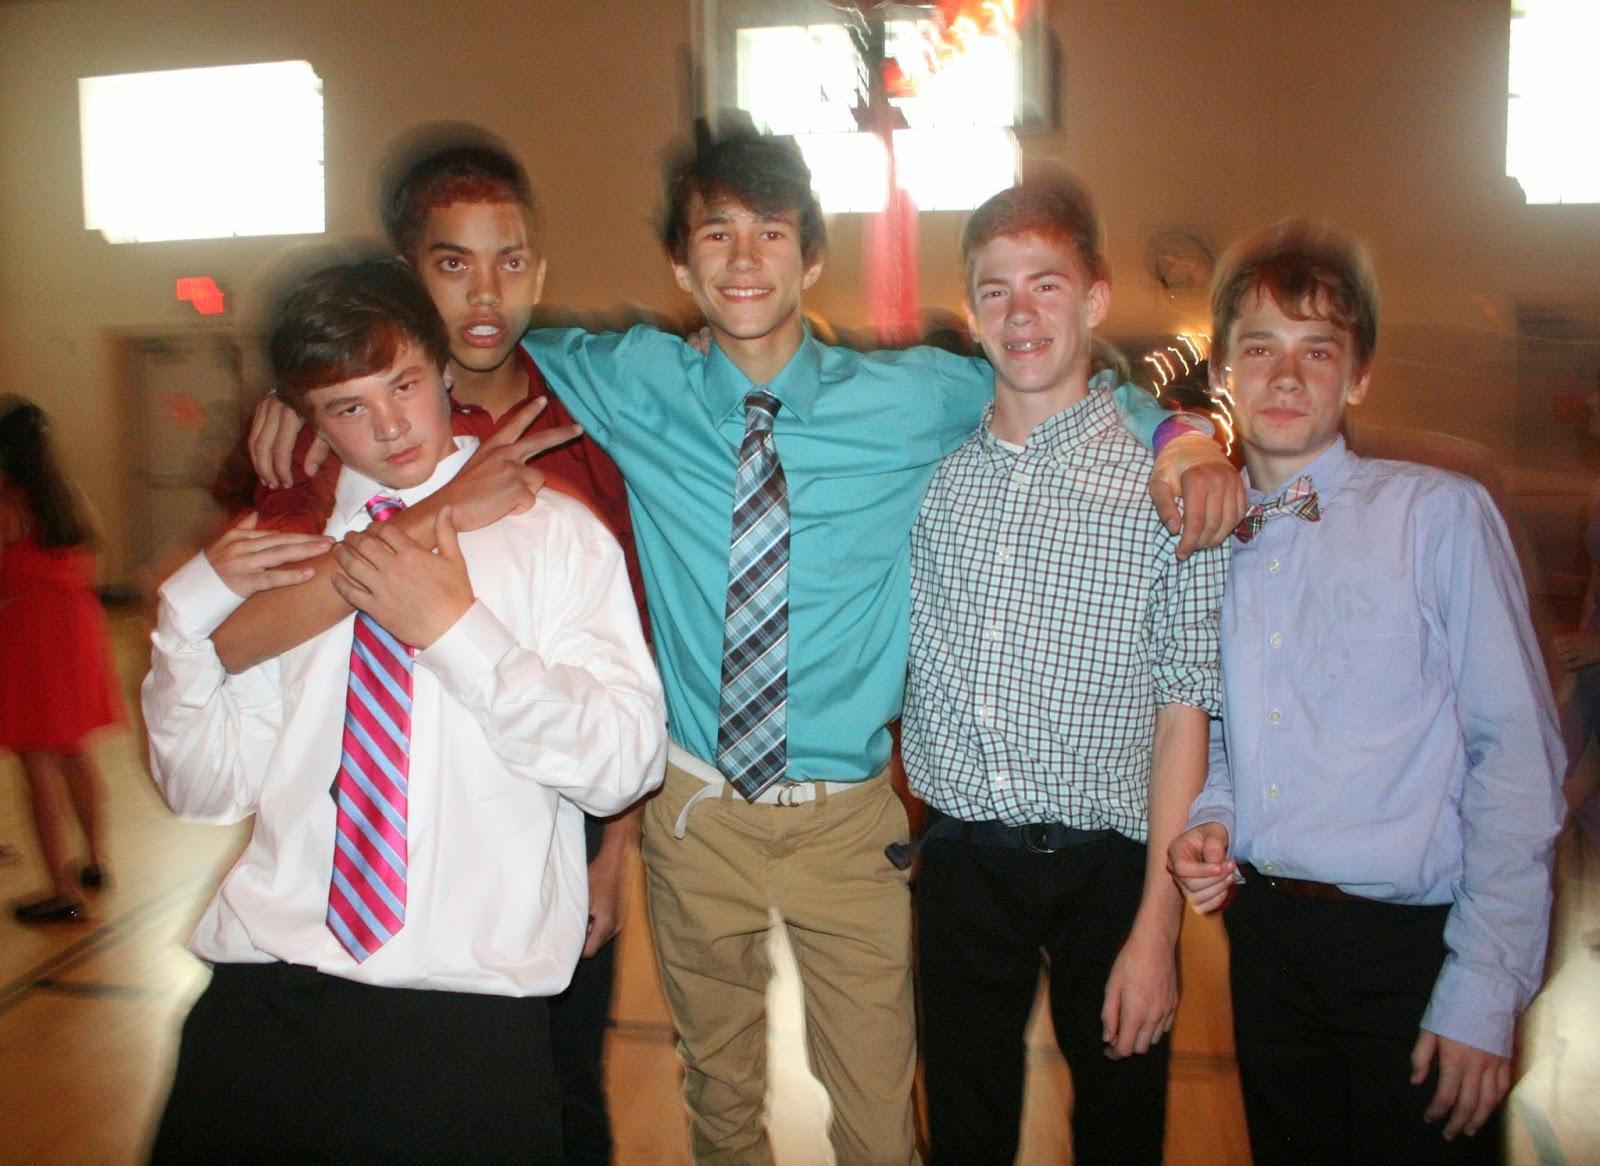 Middle School Semi Formal Dance Dress Images